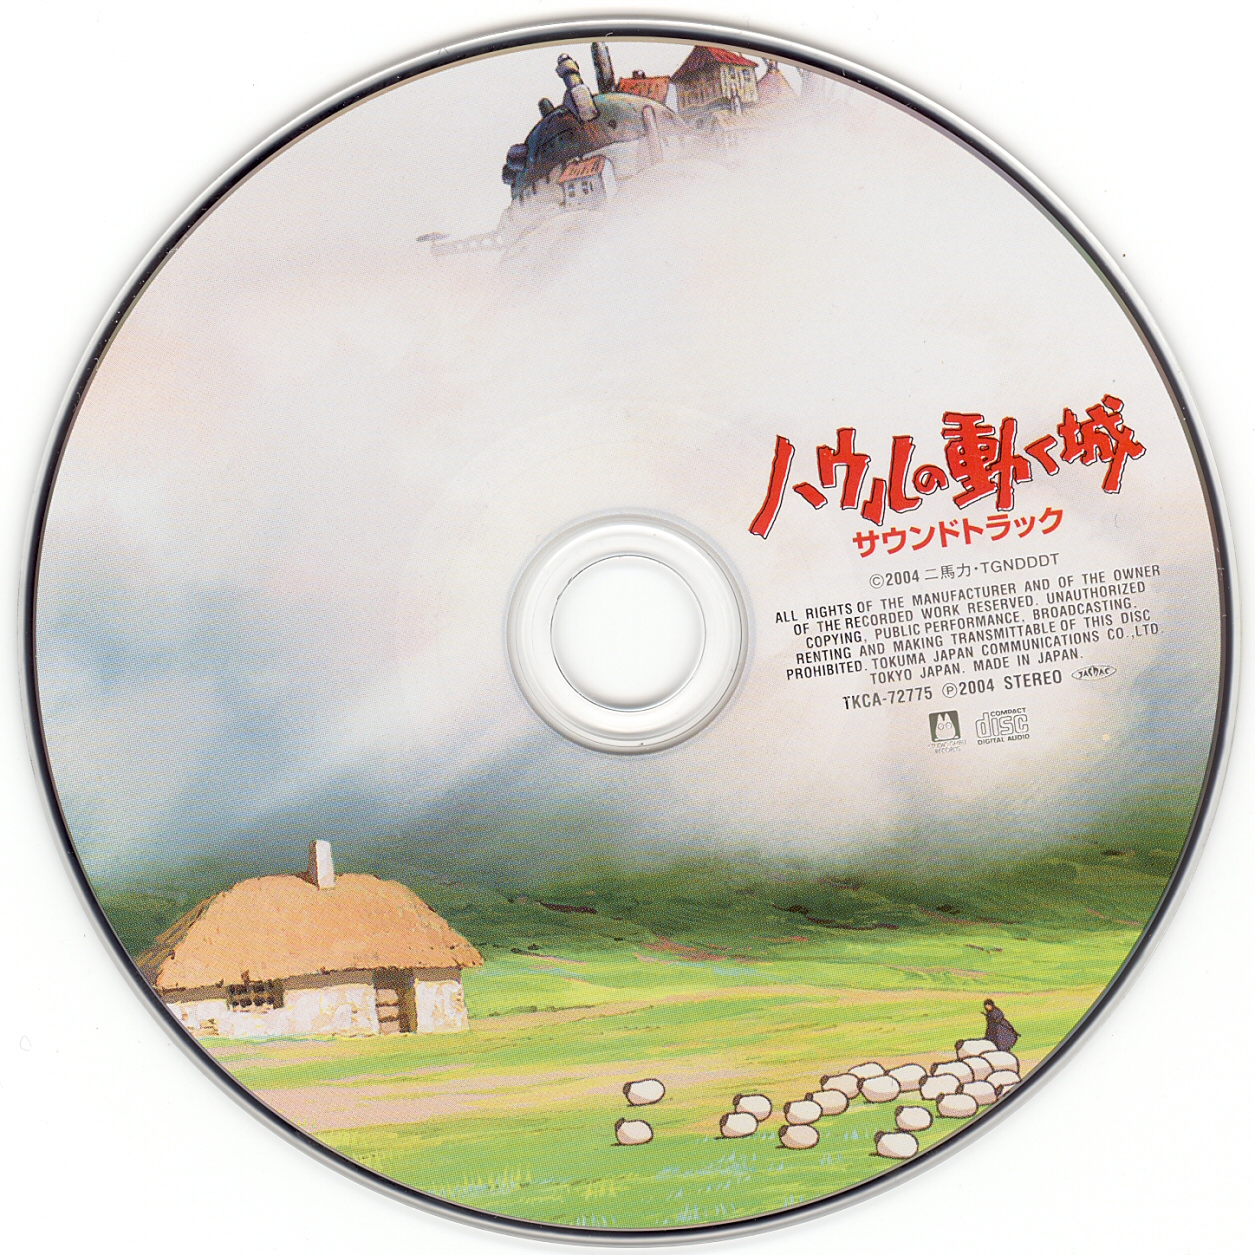 Howl's Moving Castle Soundtrack Disc.jpg